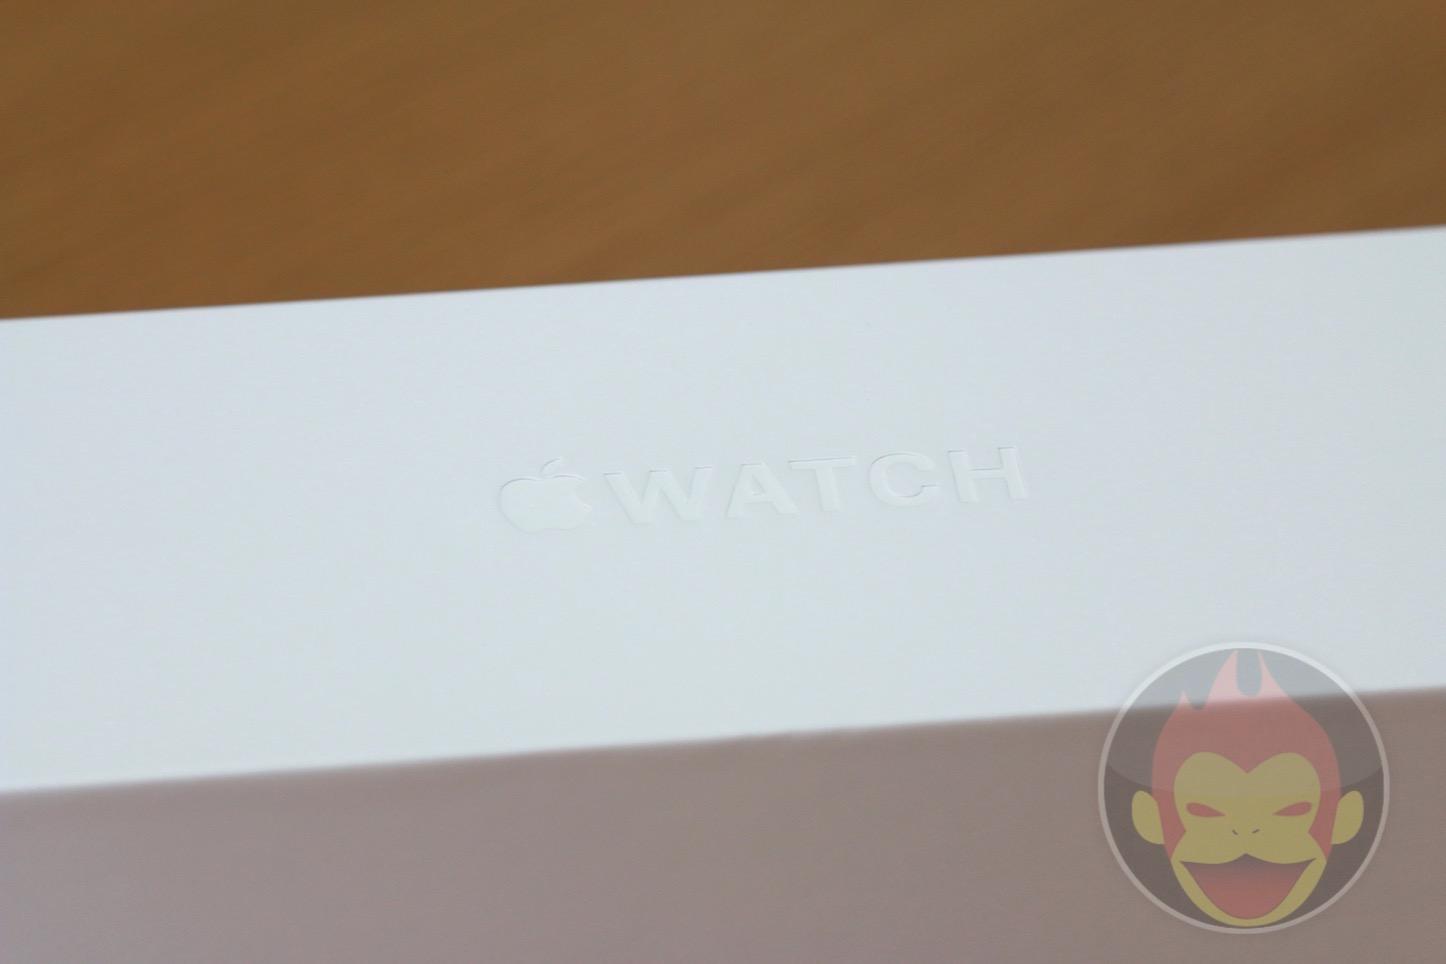 Apple-Watch-Sport-Review-01.jpg